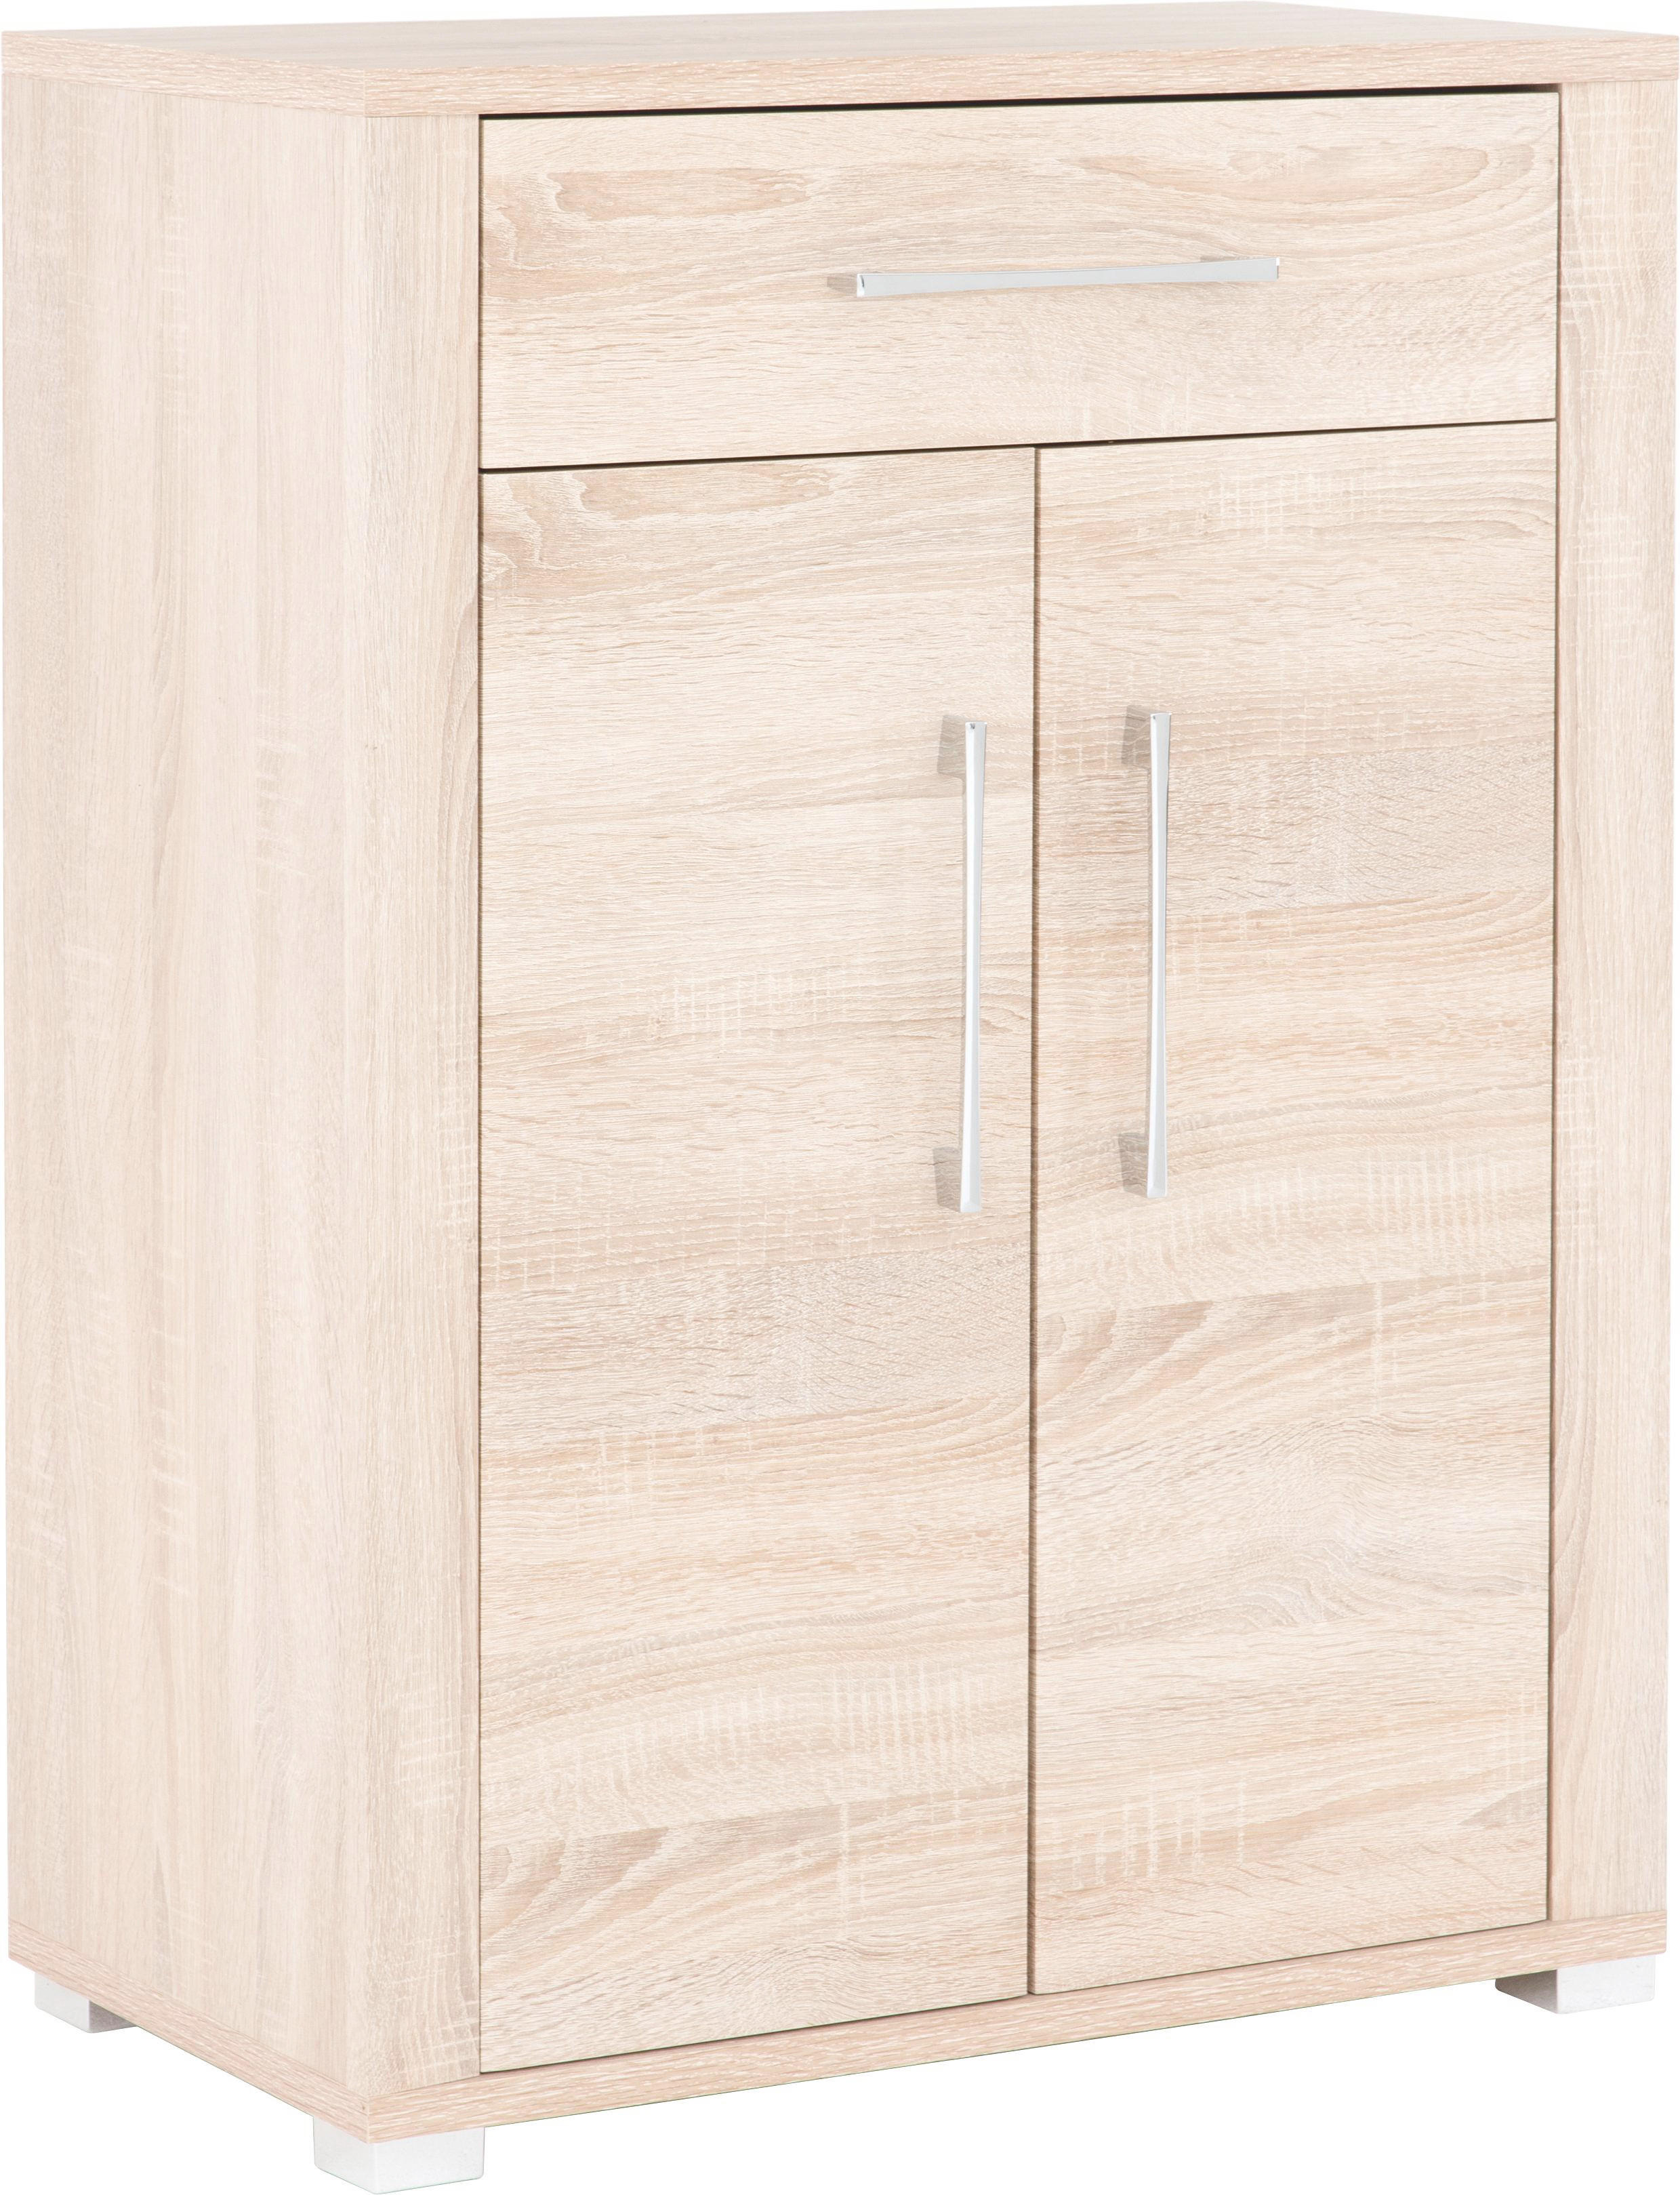 ORMAR ZA OBUĆU - boje kroma/hrast Sonoma, Konvencionalno, drvni materijal/plastika (74/100/40cm) - CANTUS